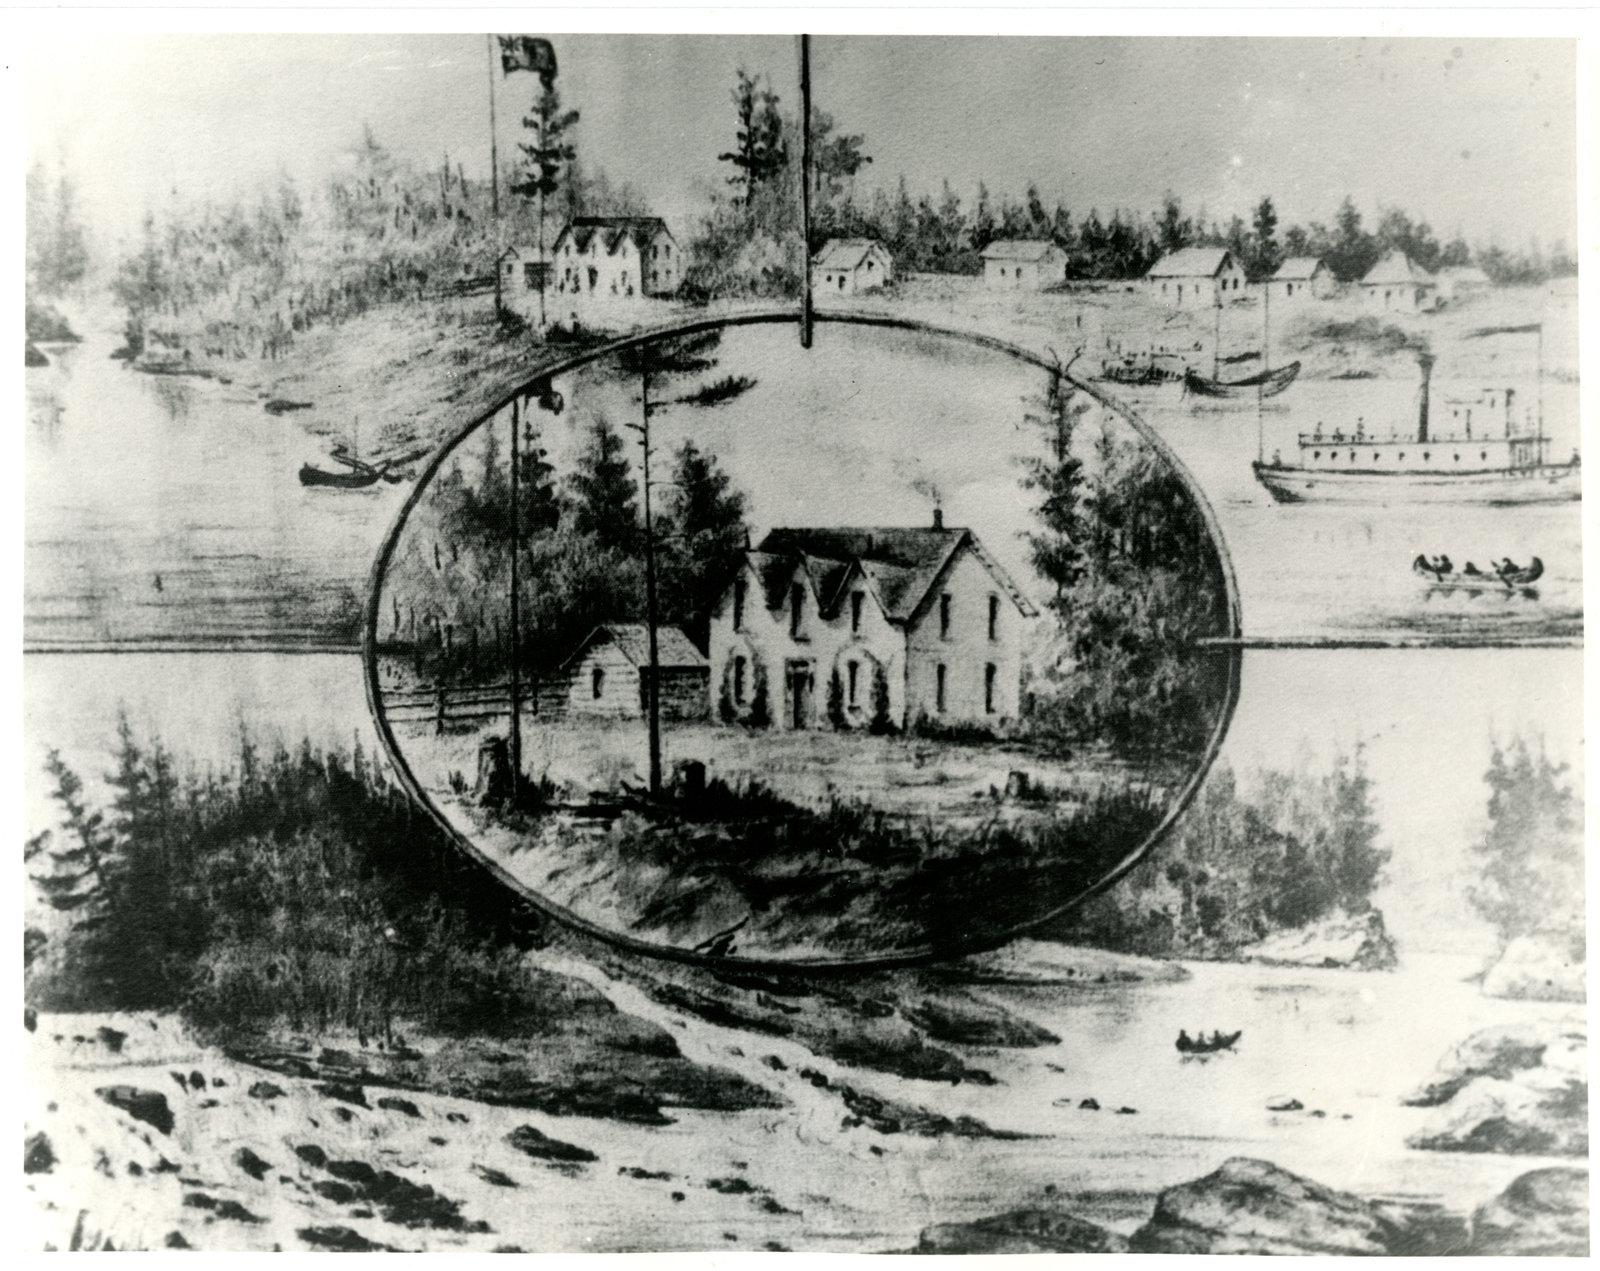 Full Image View La Premiere Colonie A Sturgeon Falls The First Settlement In Sturgeon Falls